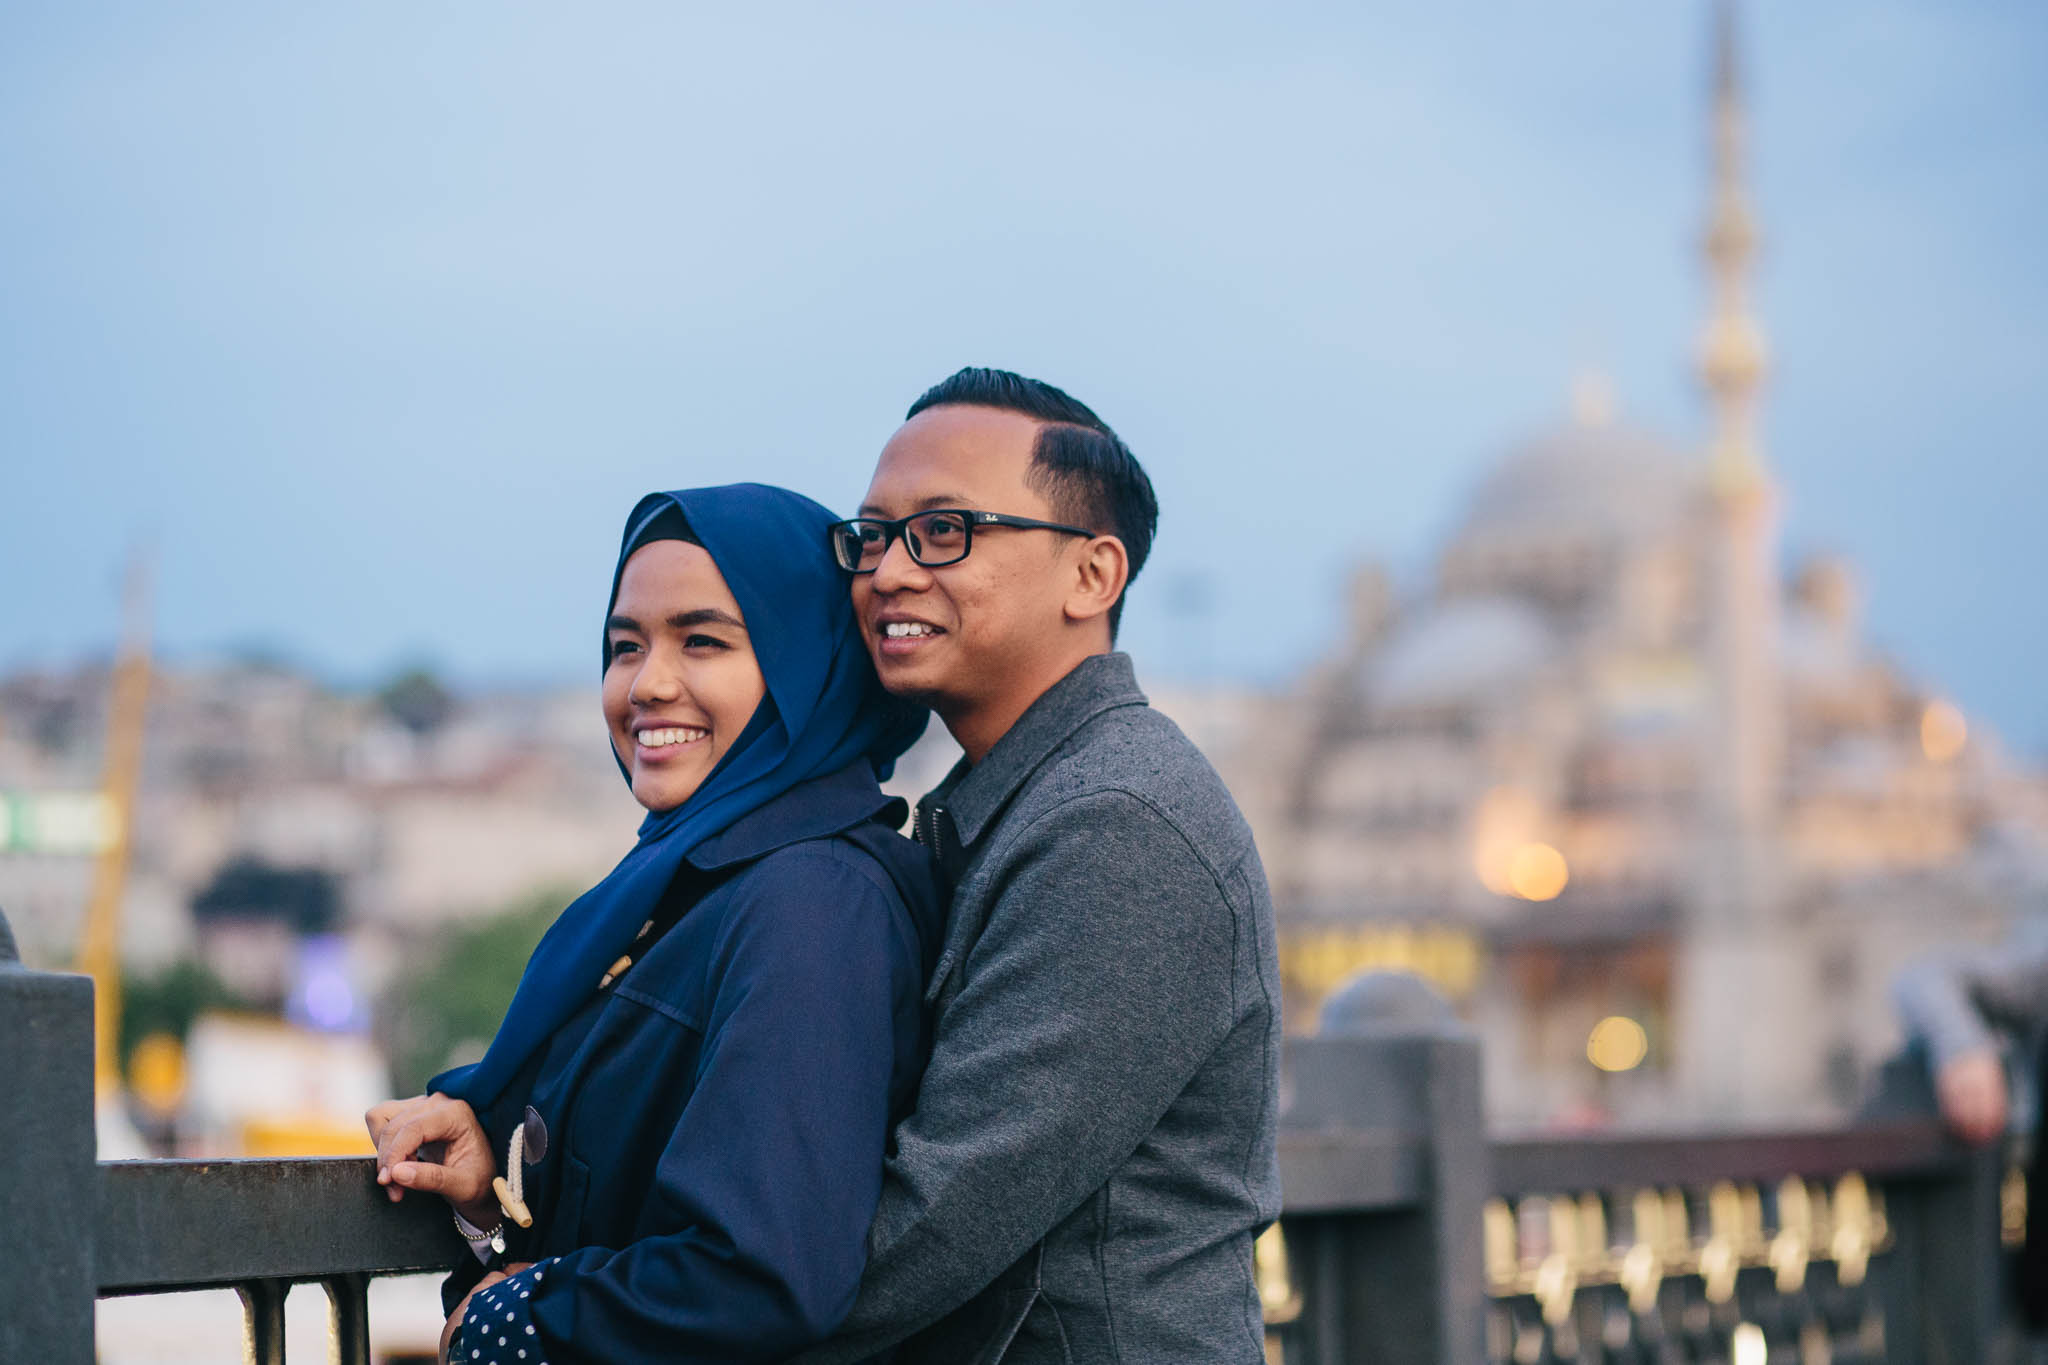 singapore-wedding-photographer-dzul-isma-istanbul-59.jpg